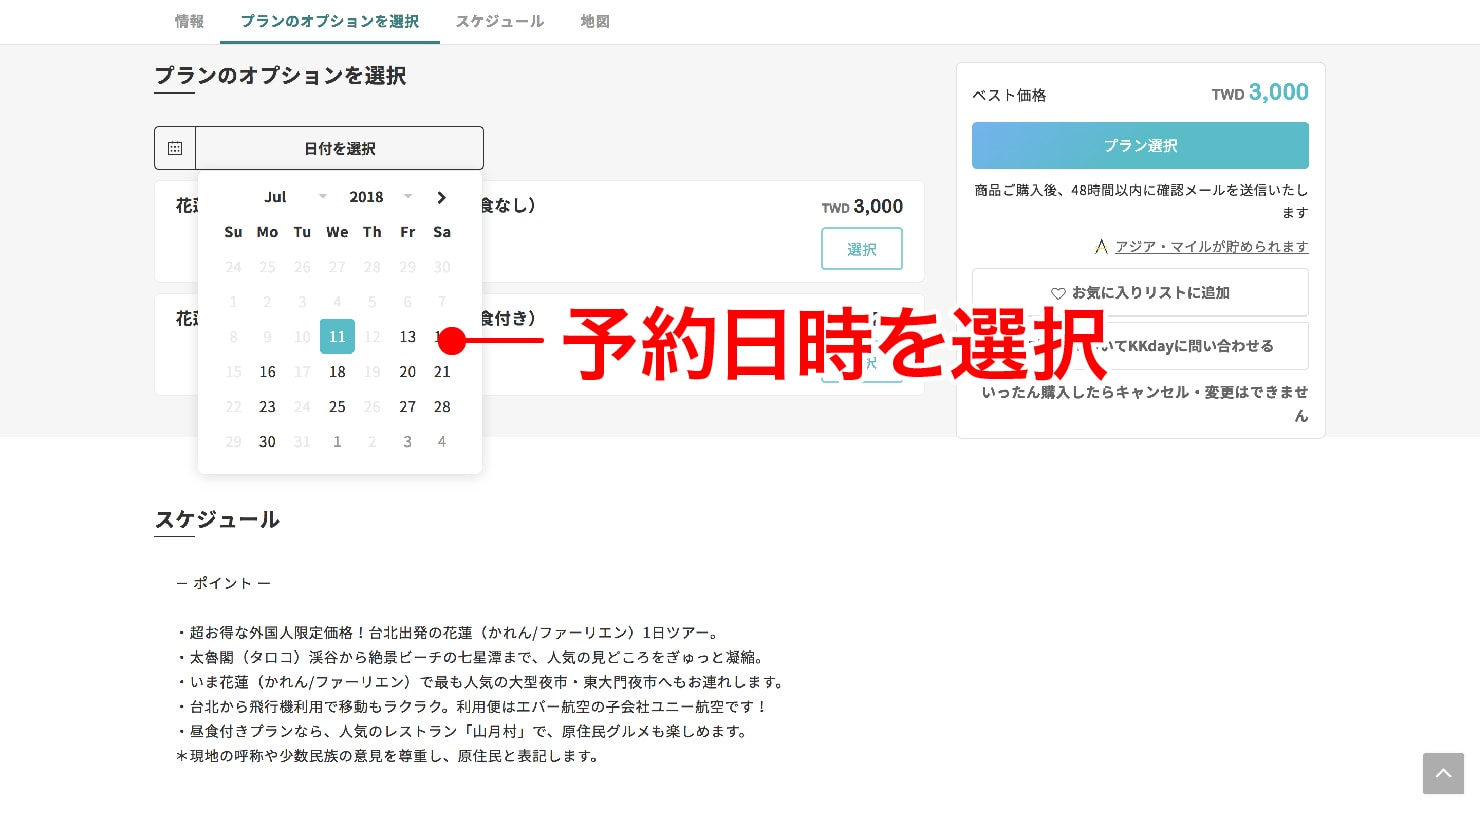 KKday外国人限定「花蓮・太魯閣(タロコ)日帰りツアー」の予約画面4